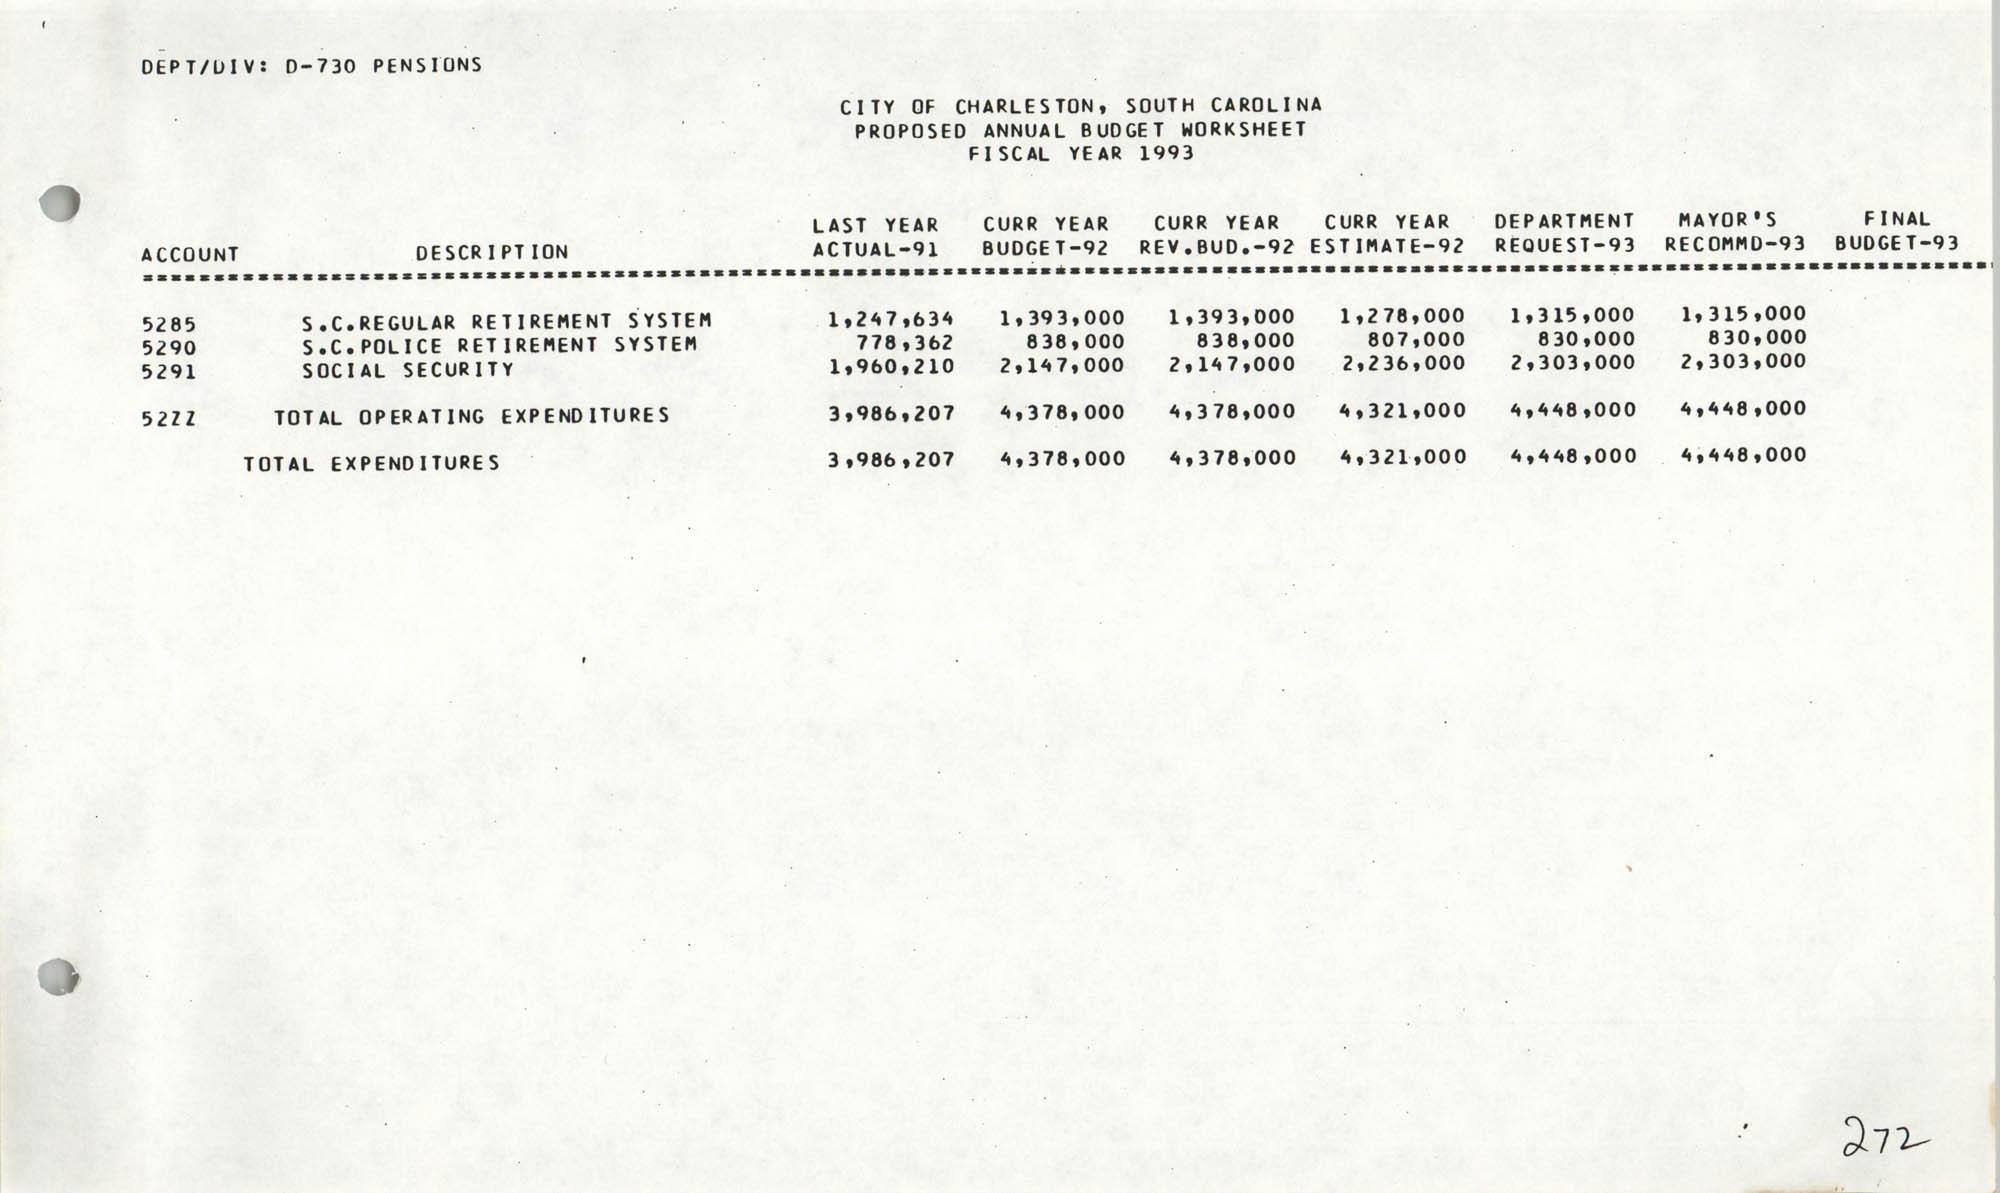 The City Council of Charleston, South Carolina, 1993 Budget, Page 272